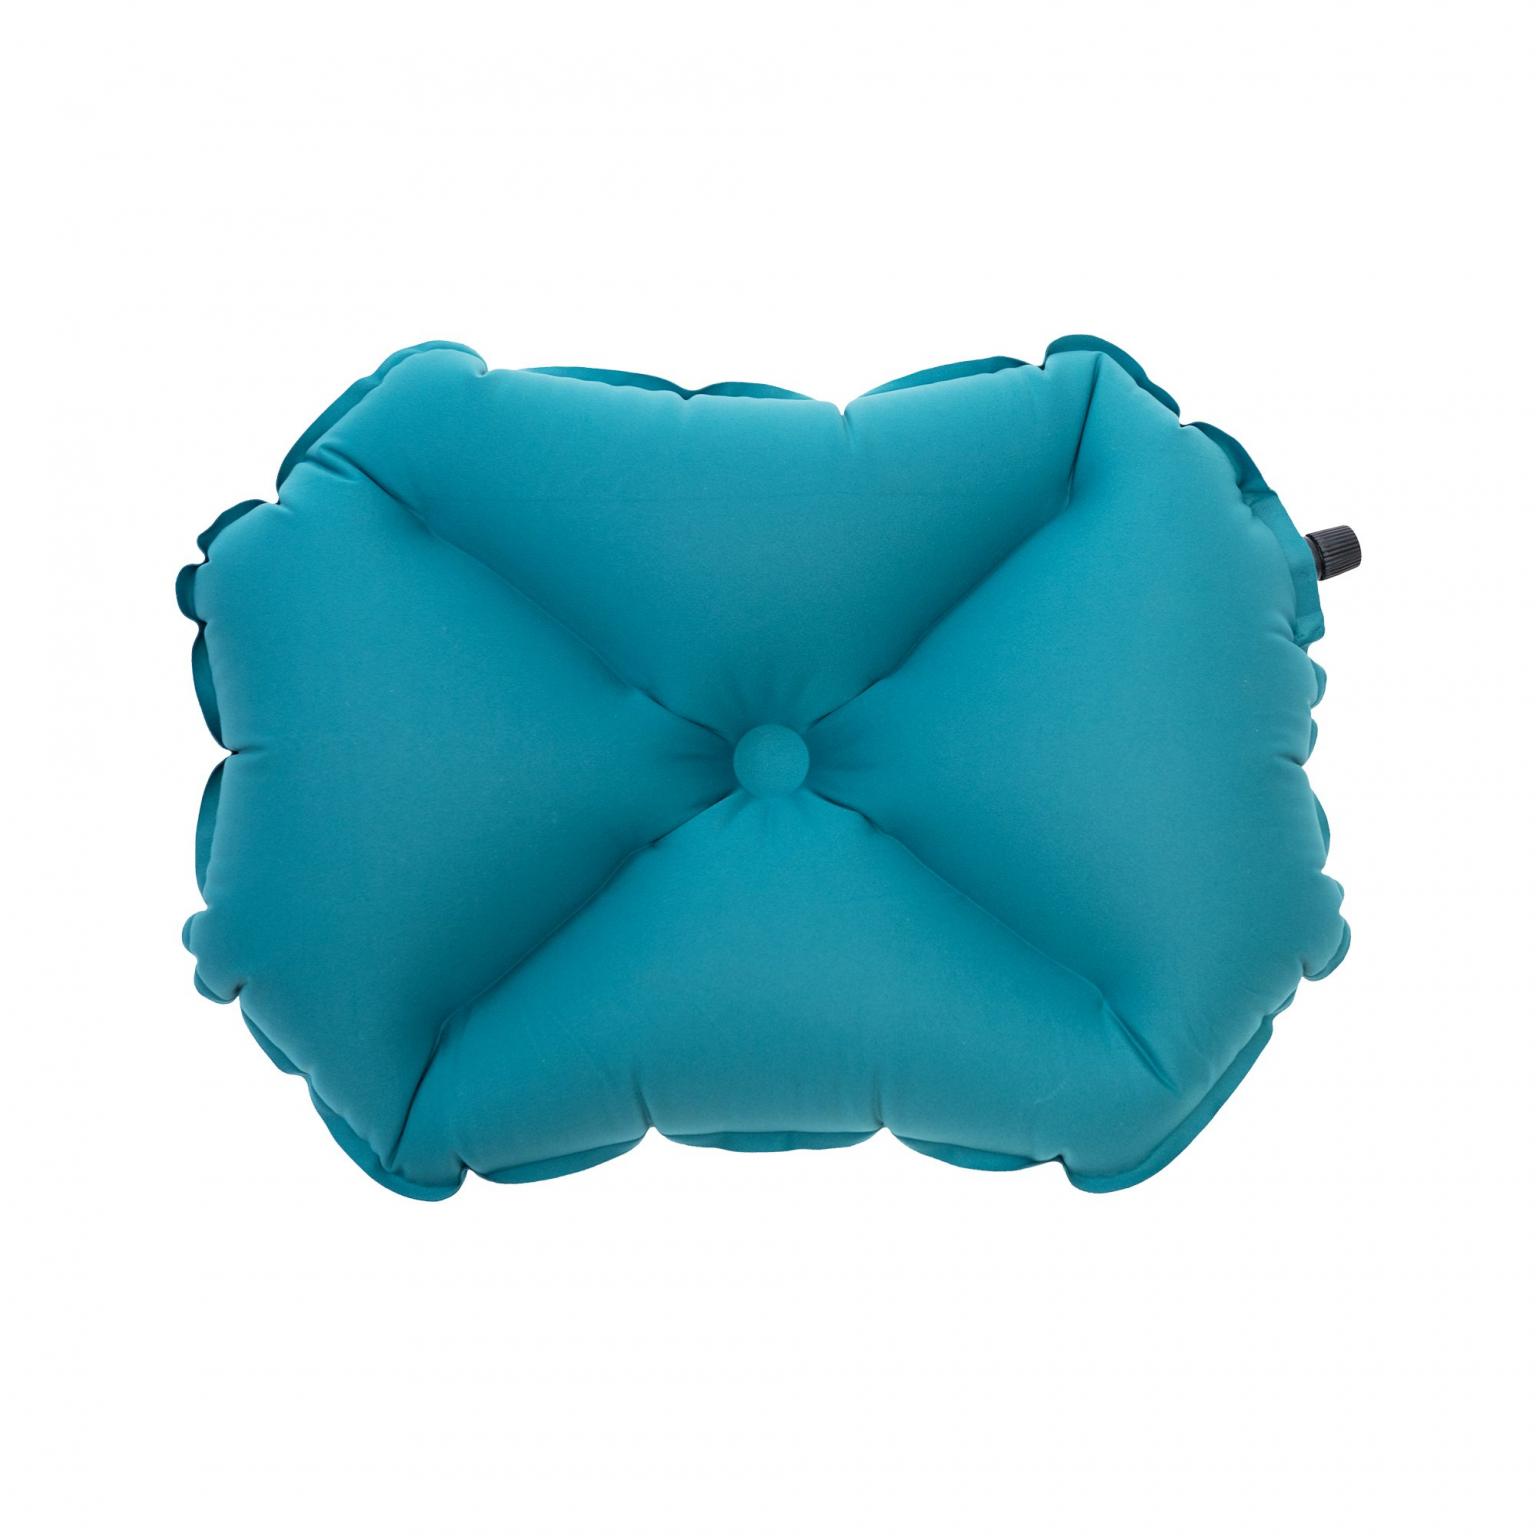 Надувная подушка Pillow X large Green, зеленый (+ Антисептик-спрей для рук в подарок!)